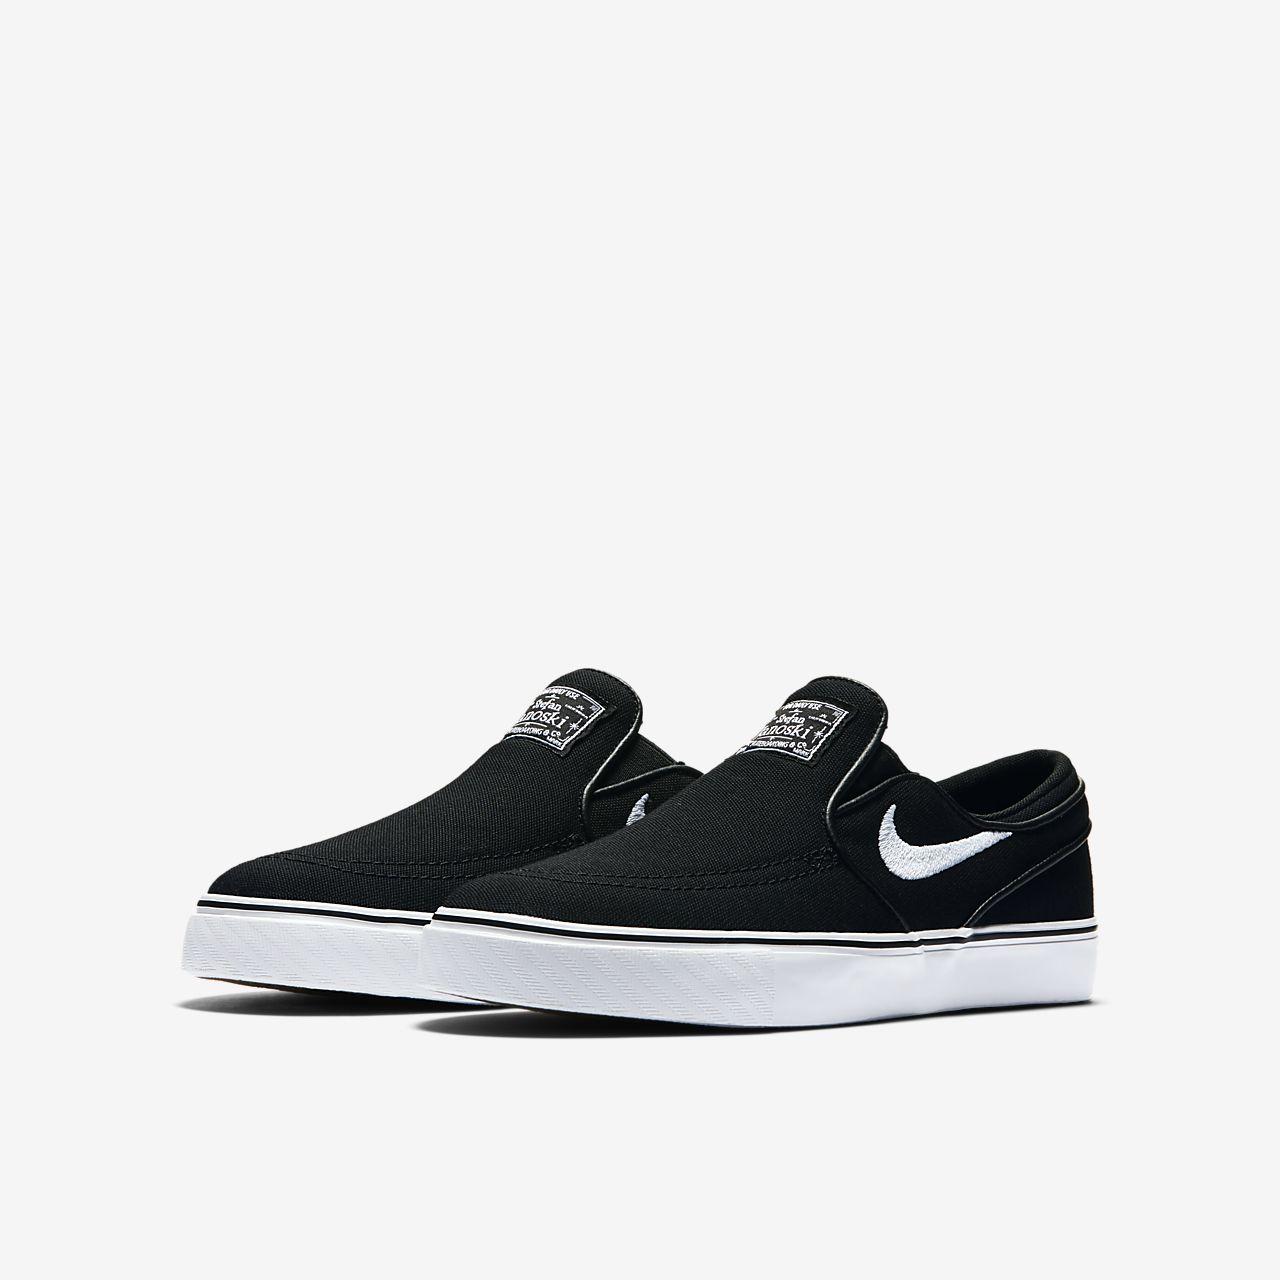 Nike SB Stefan Janoski Canvas Slip-on Big Kids  Skateboarding Shoe ... b2358a06b